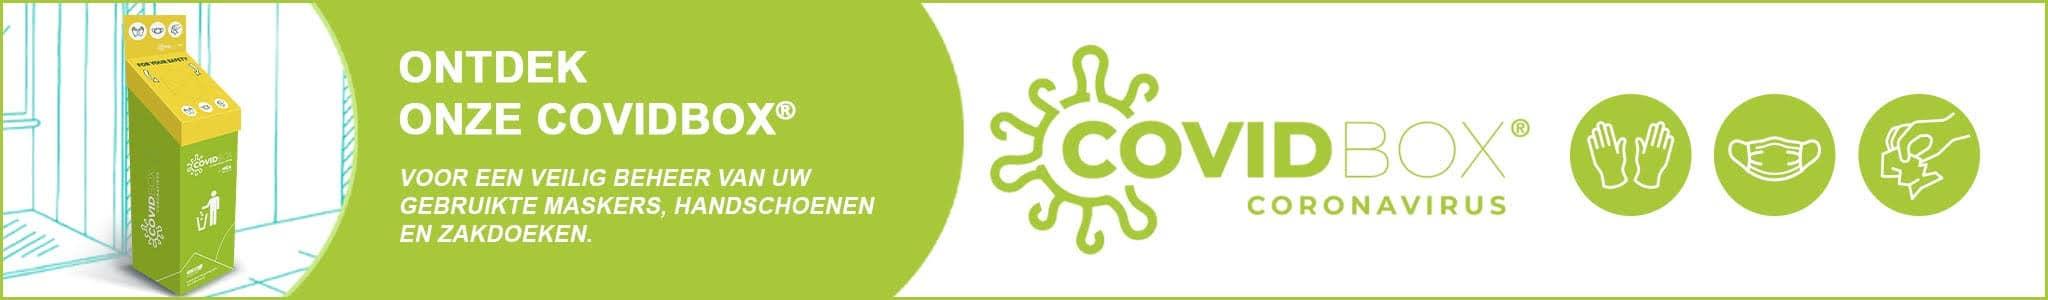 Ontdek onze COVIDBOX